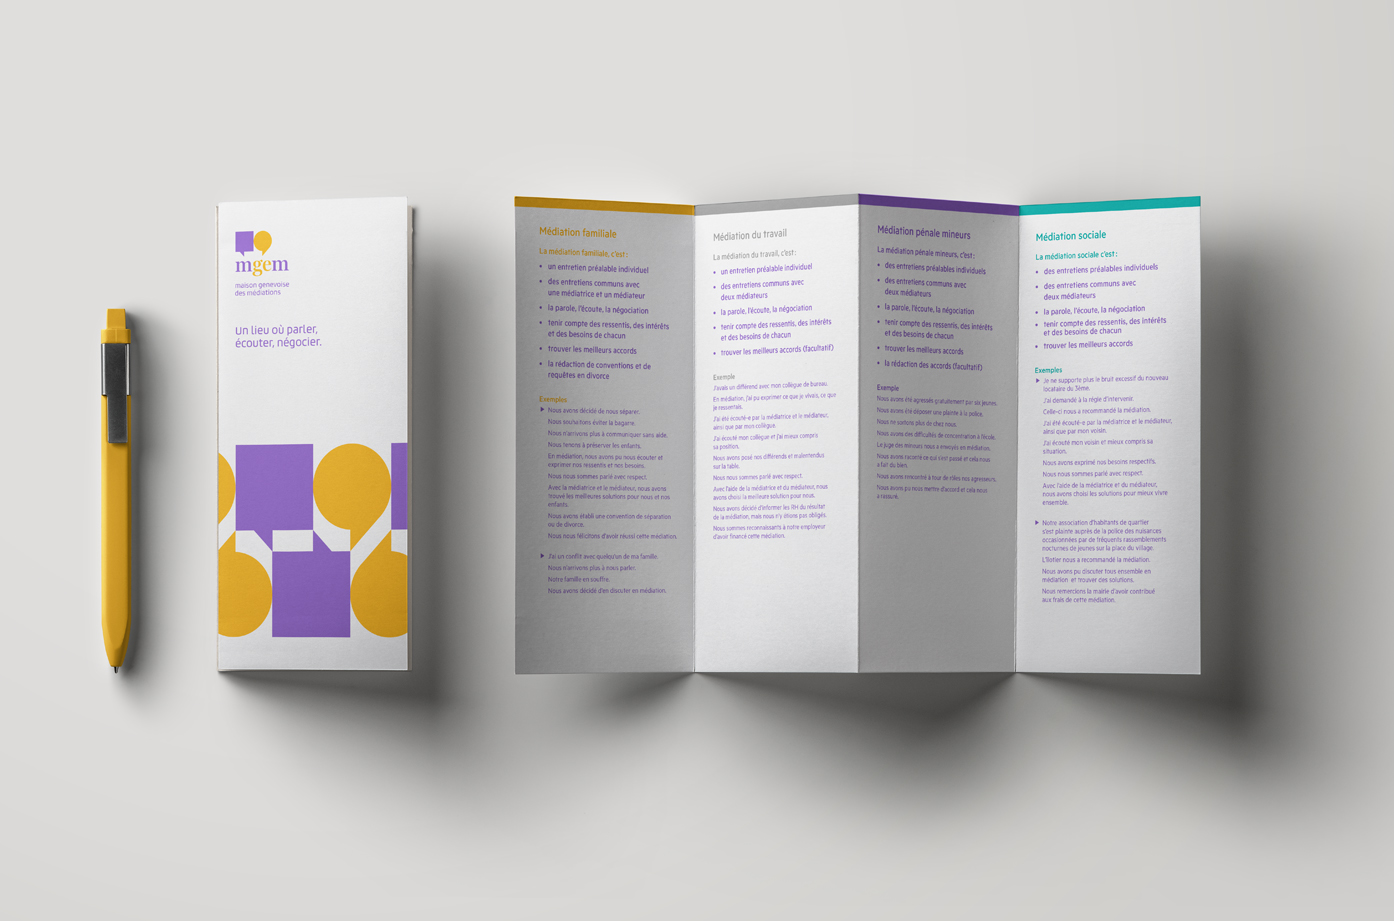 Maison-genevoise-mediation-Identite-Depliant-Graphique-Sophie-Jaton